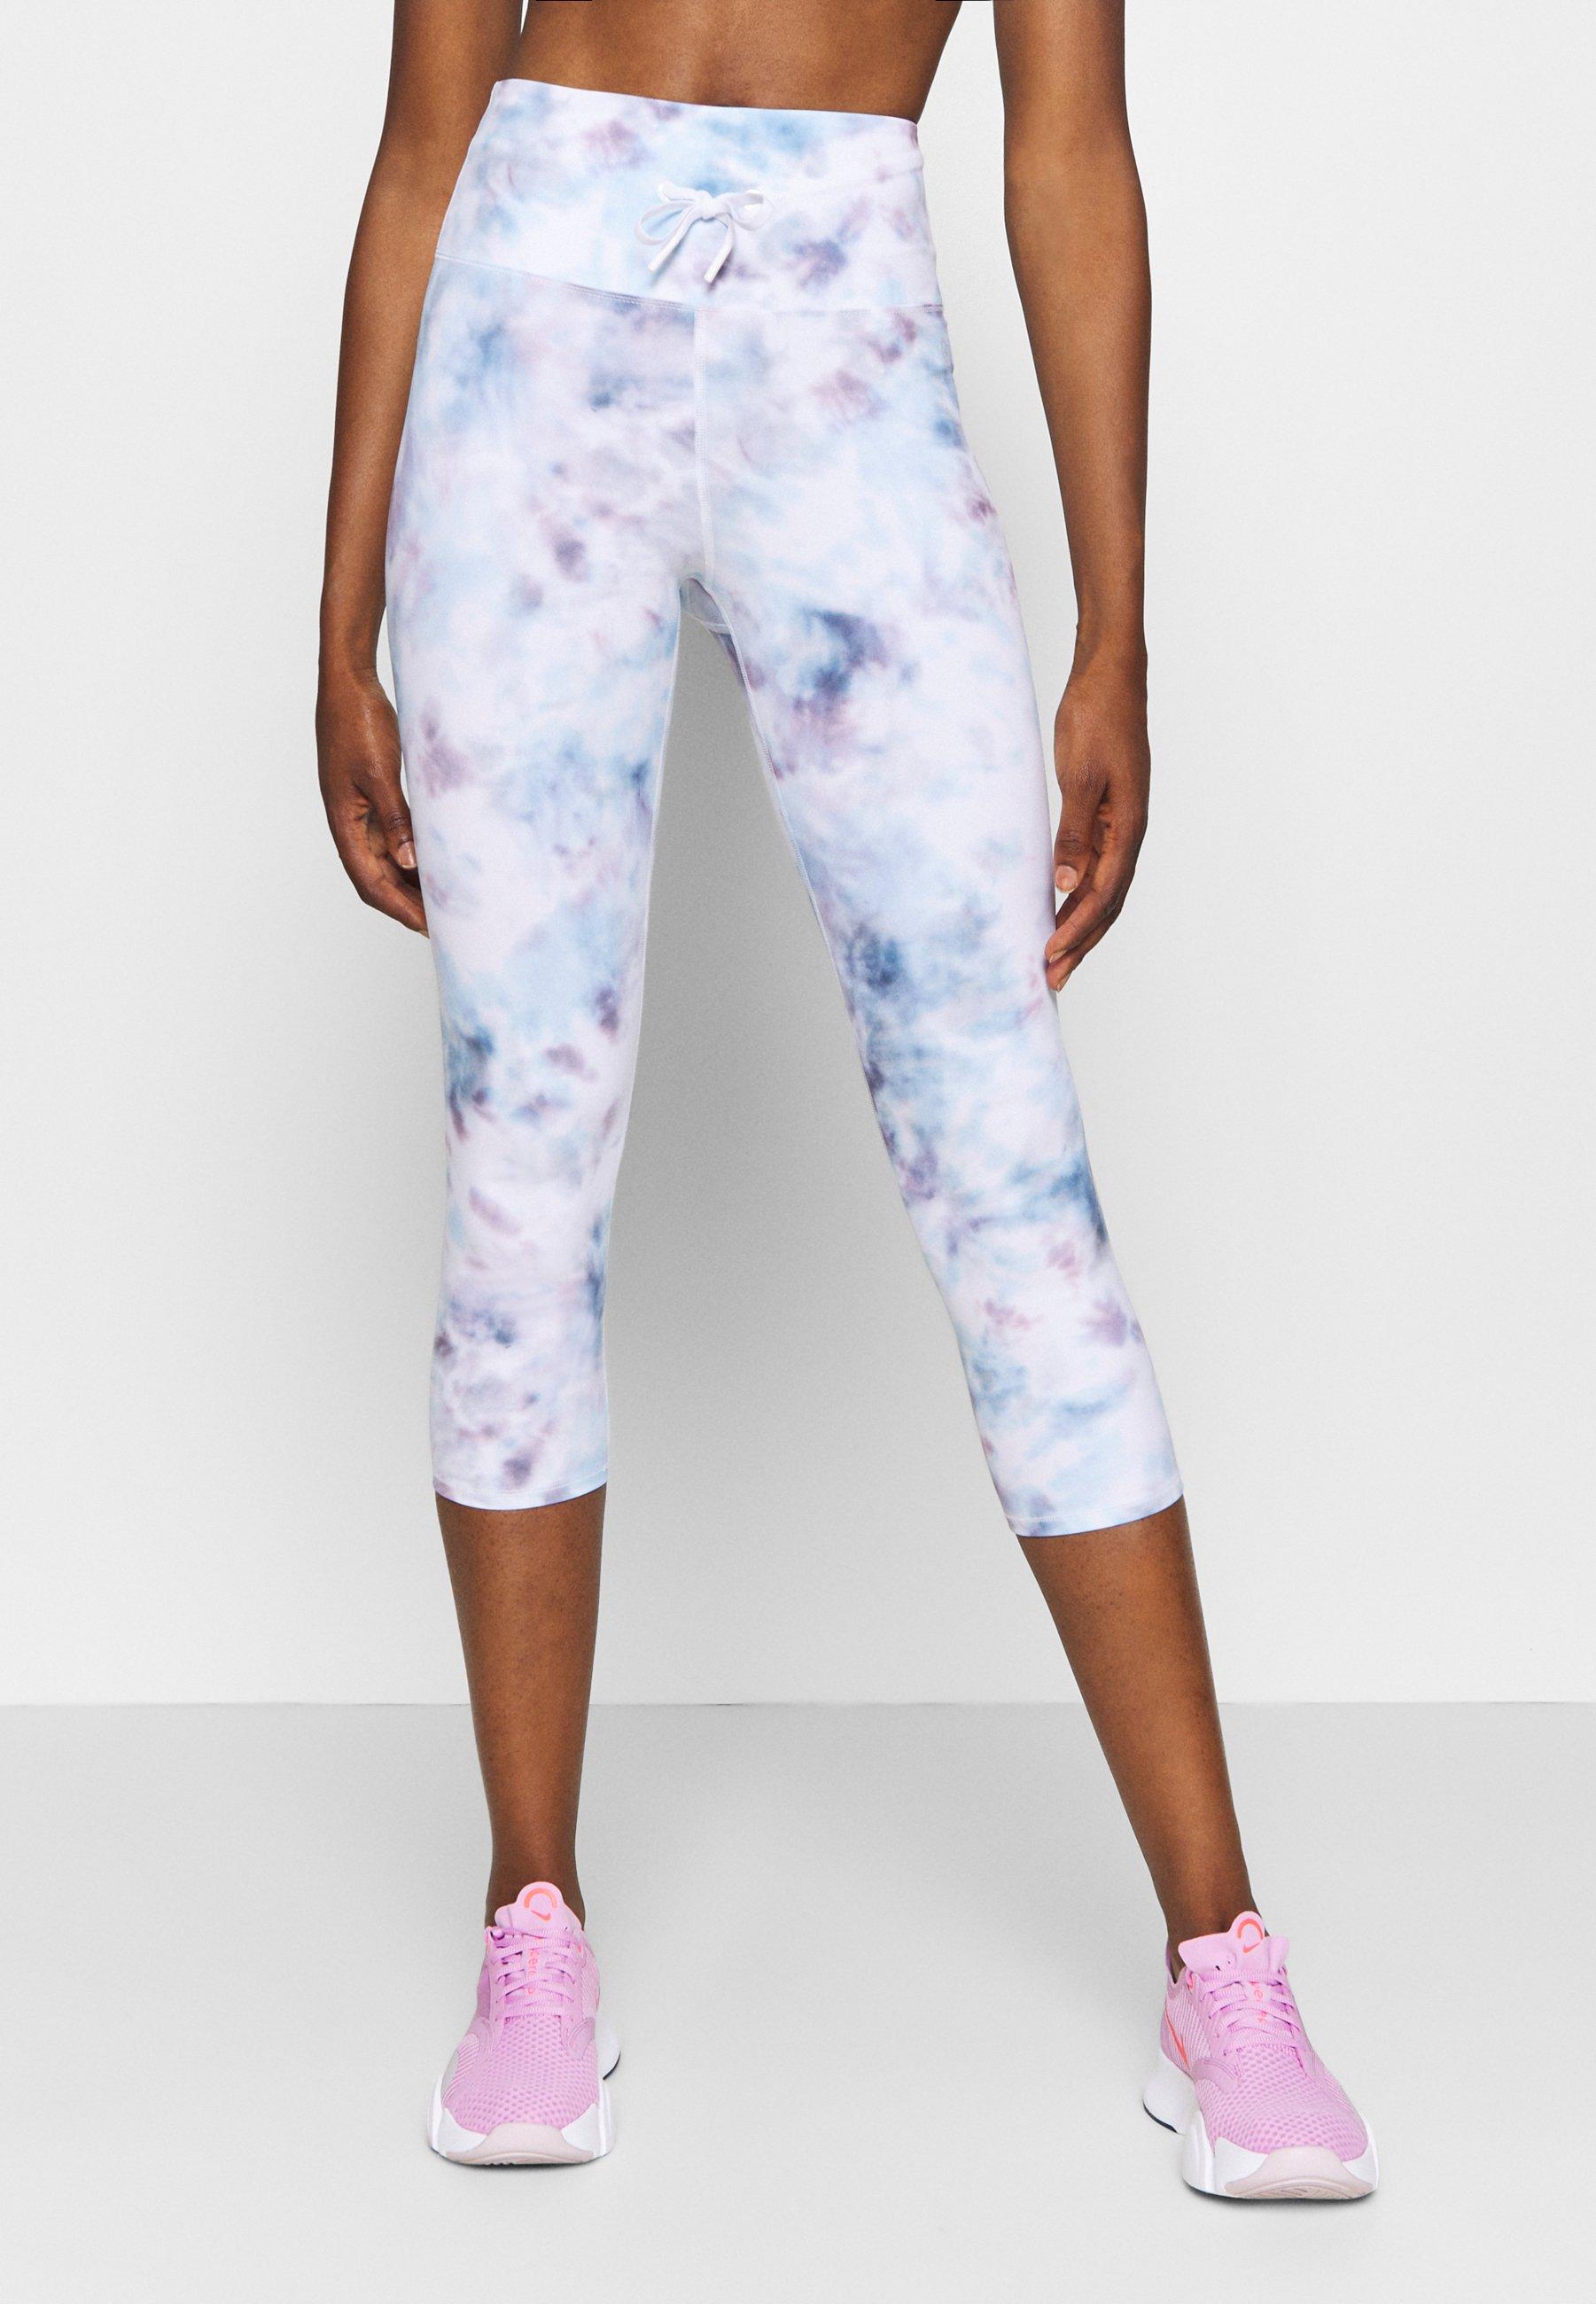 Femme SHEEN TIE WAIST CAPRI - Pantalon 3/4 de sport